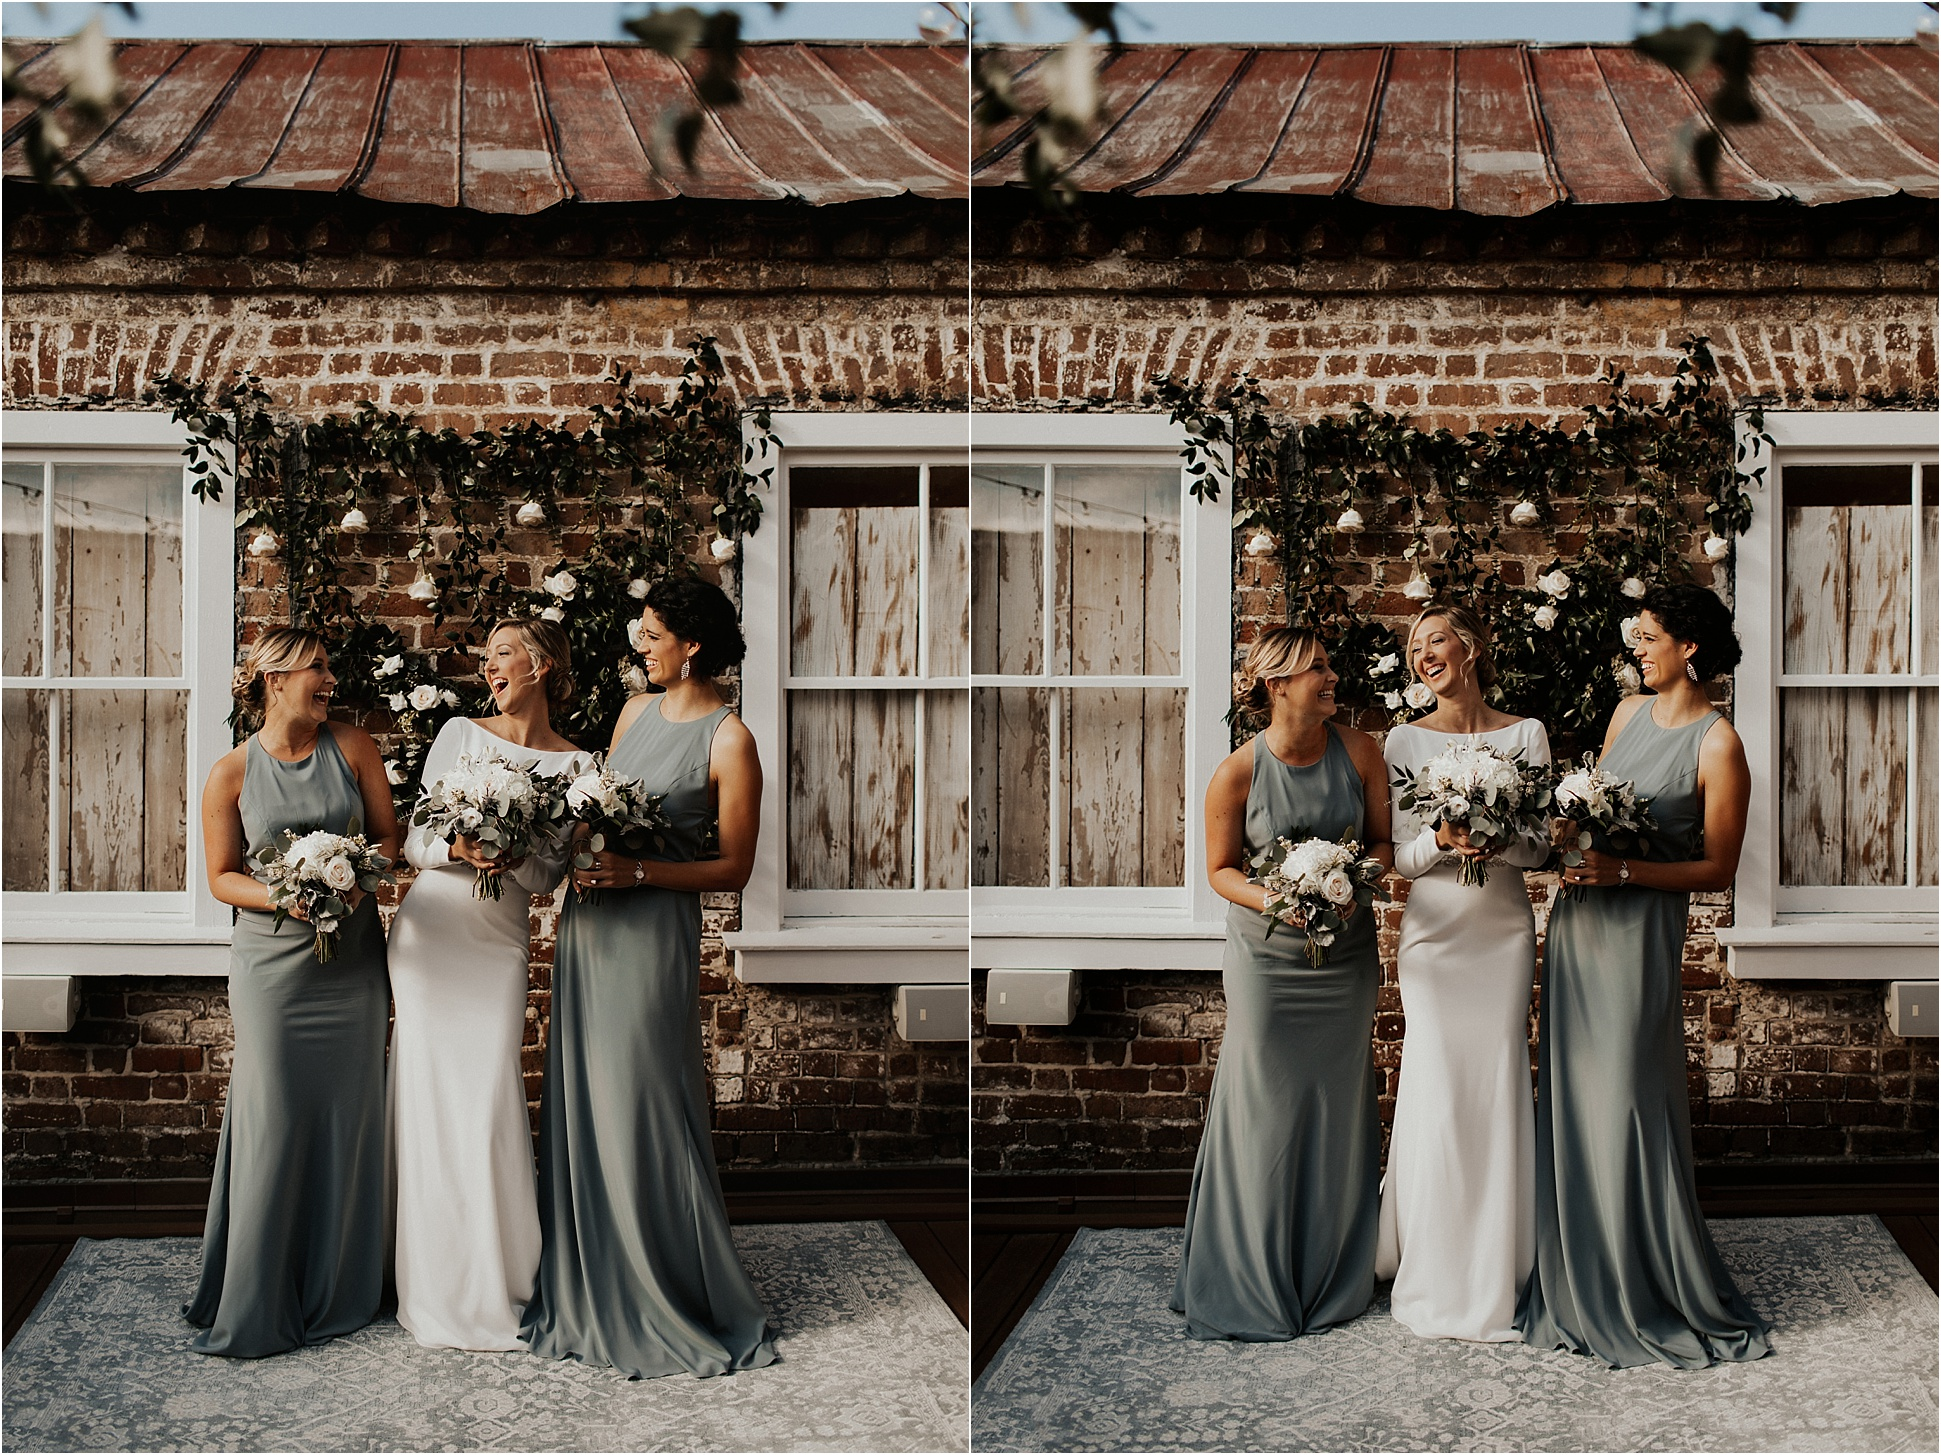 upstairs_midtown_intimate_charleston_wedding019.JPG